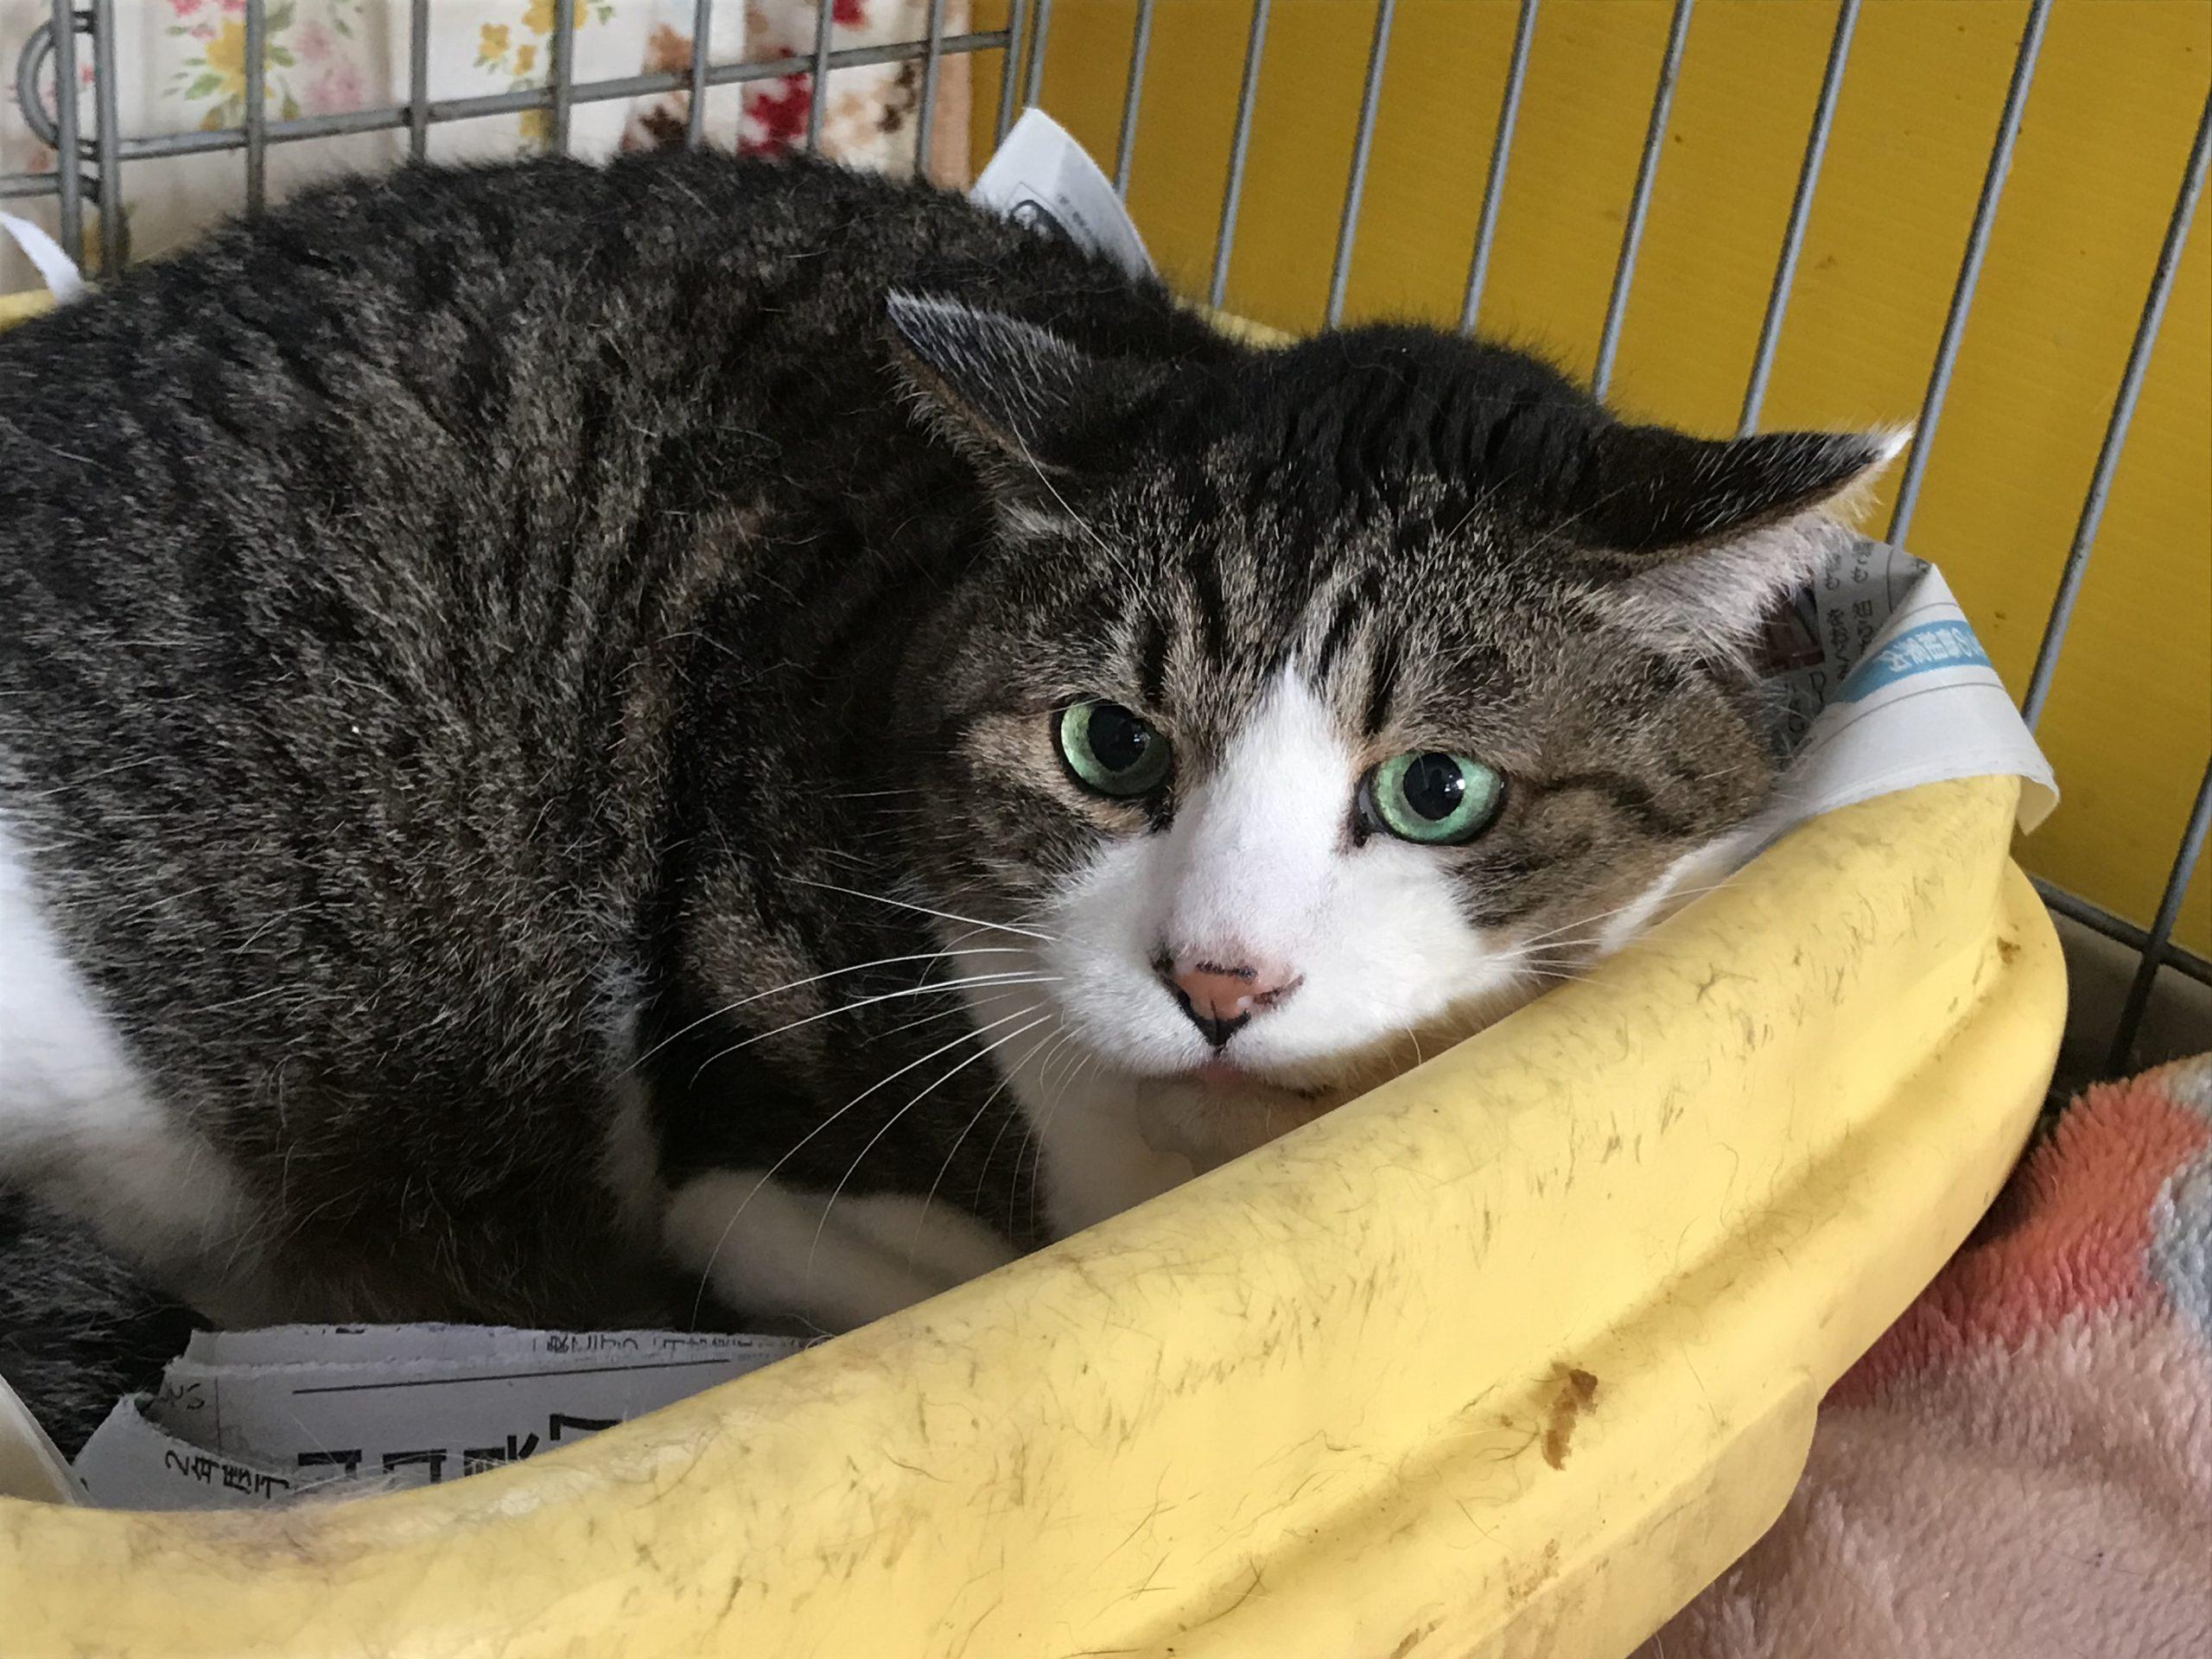 <p></p> <ul> <li>猫種:日本猫 キジ白</li> <li>性別:男の子</li> <li>名前:トト</li> <li>年齢:2007年10月</li> <li>保護経緯:飼い主様が施設に入居のため飼育困難になりました</li> </ul>